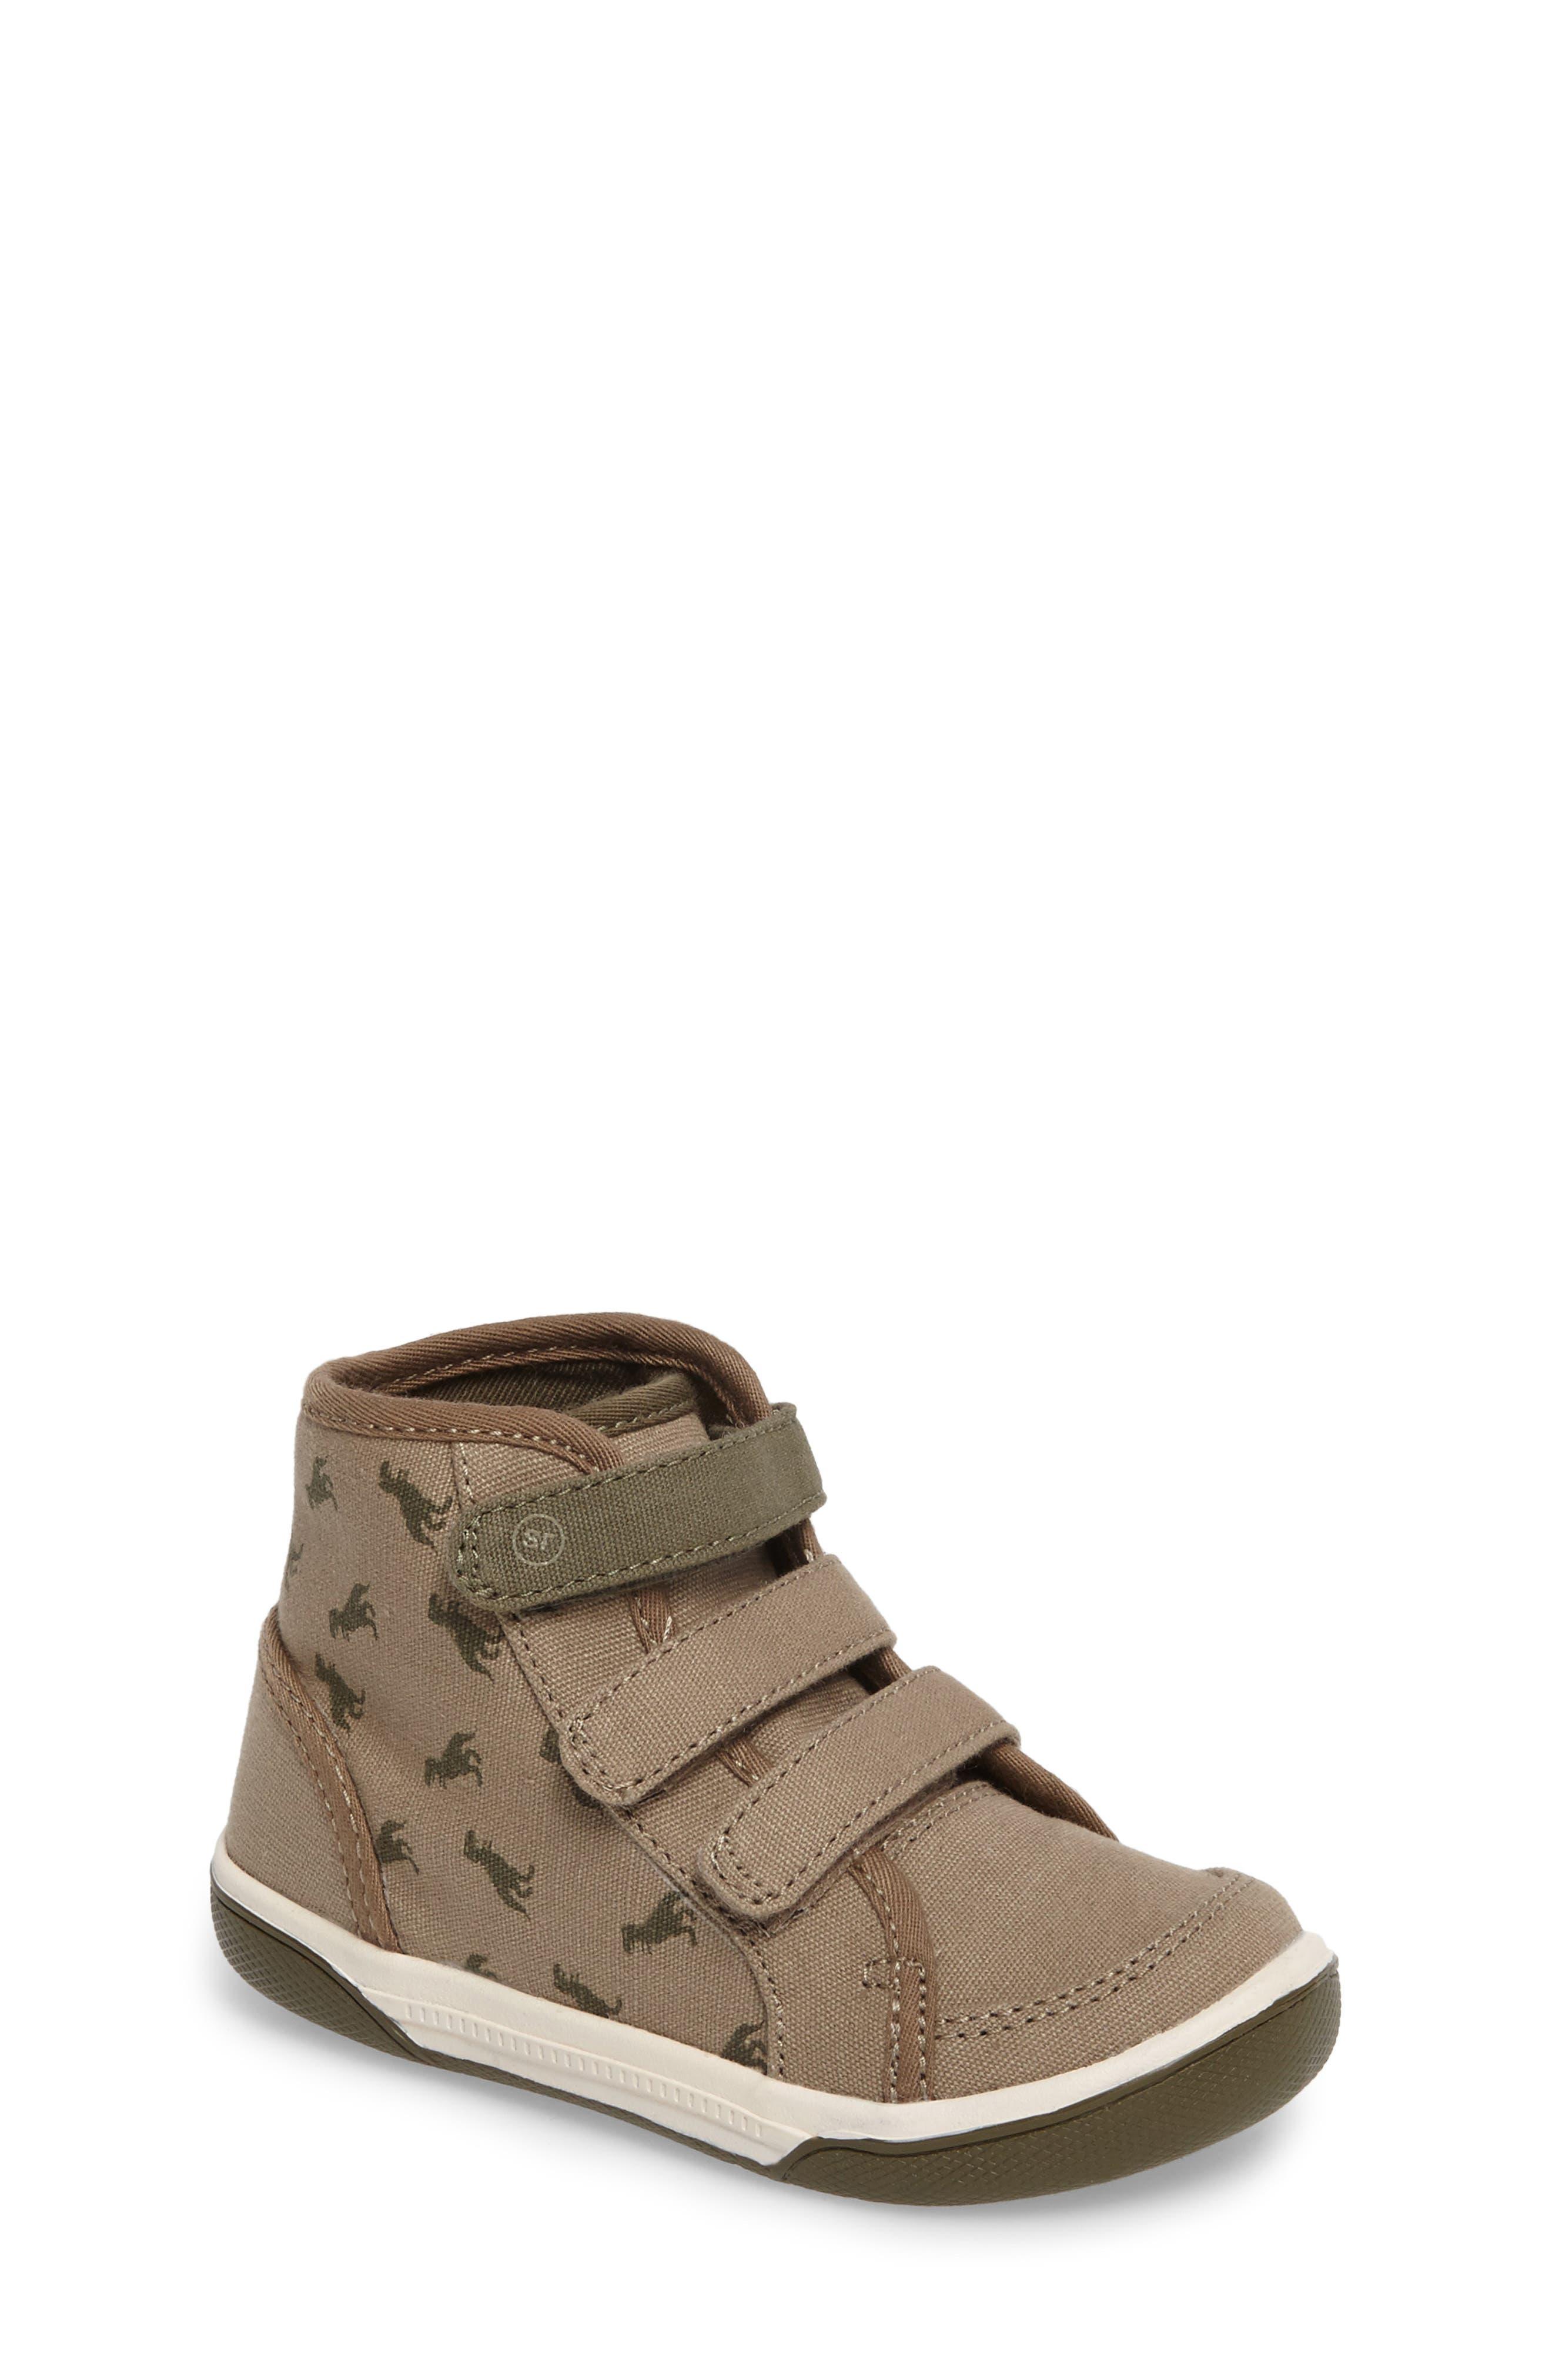 Stride Rite Ellis T-Rex High Top Sneaker (Baby, Walker & Toddler)